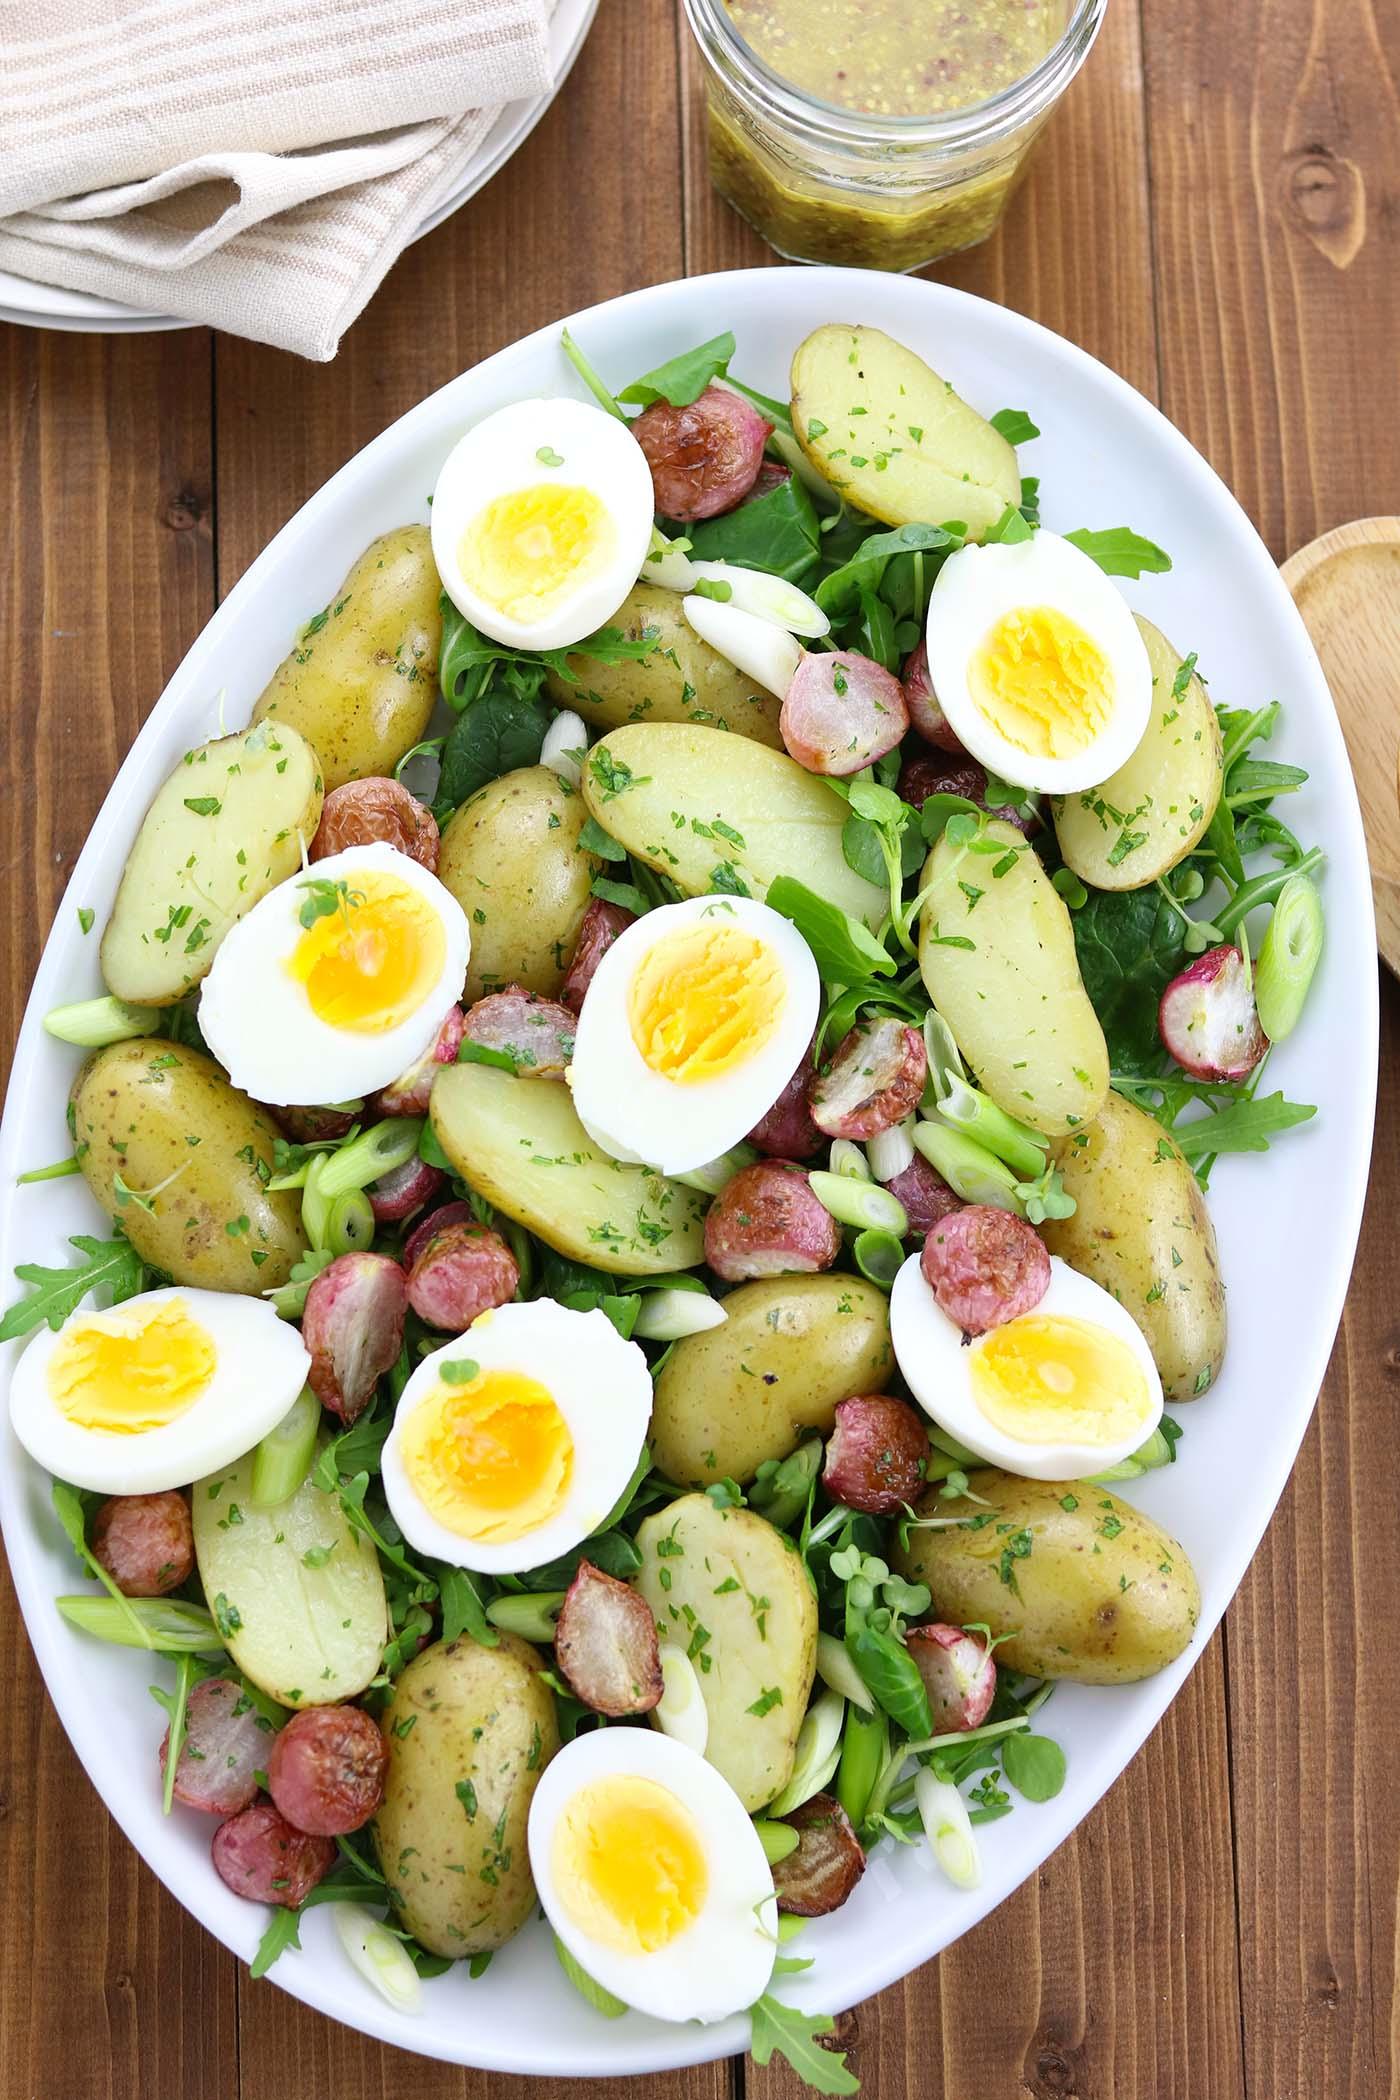 Napravite salatu sa krompirom